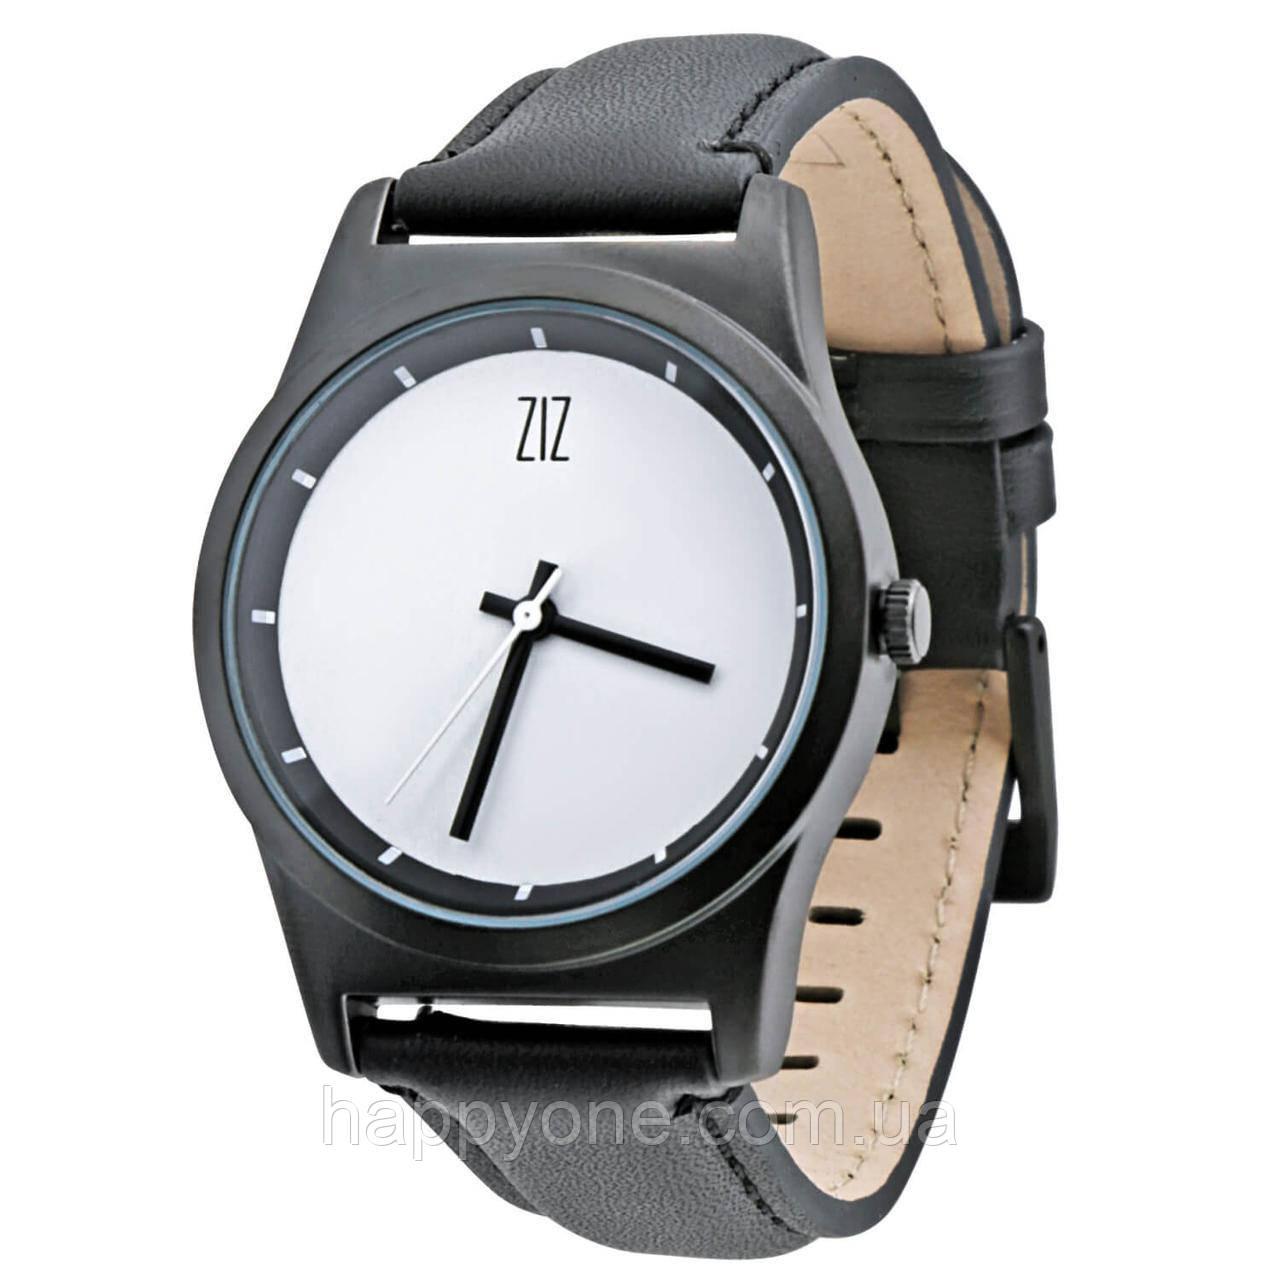 "Часы ""6 секунд"" White (черный ремешок)"